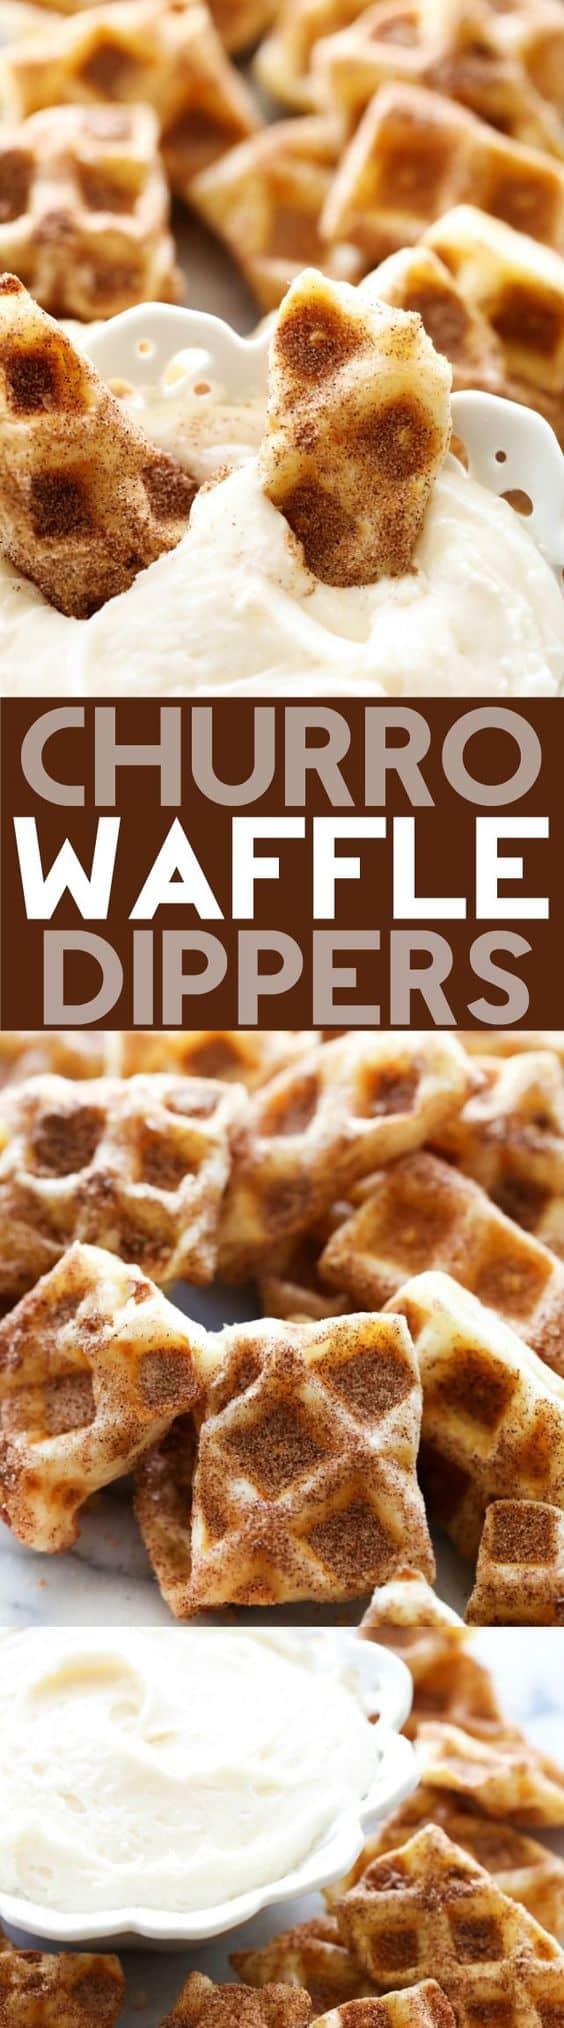 Churro waffle dippers